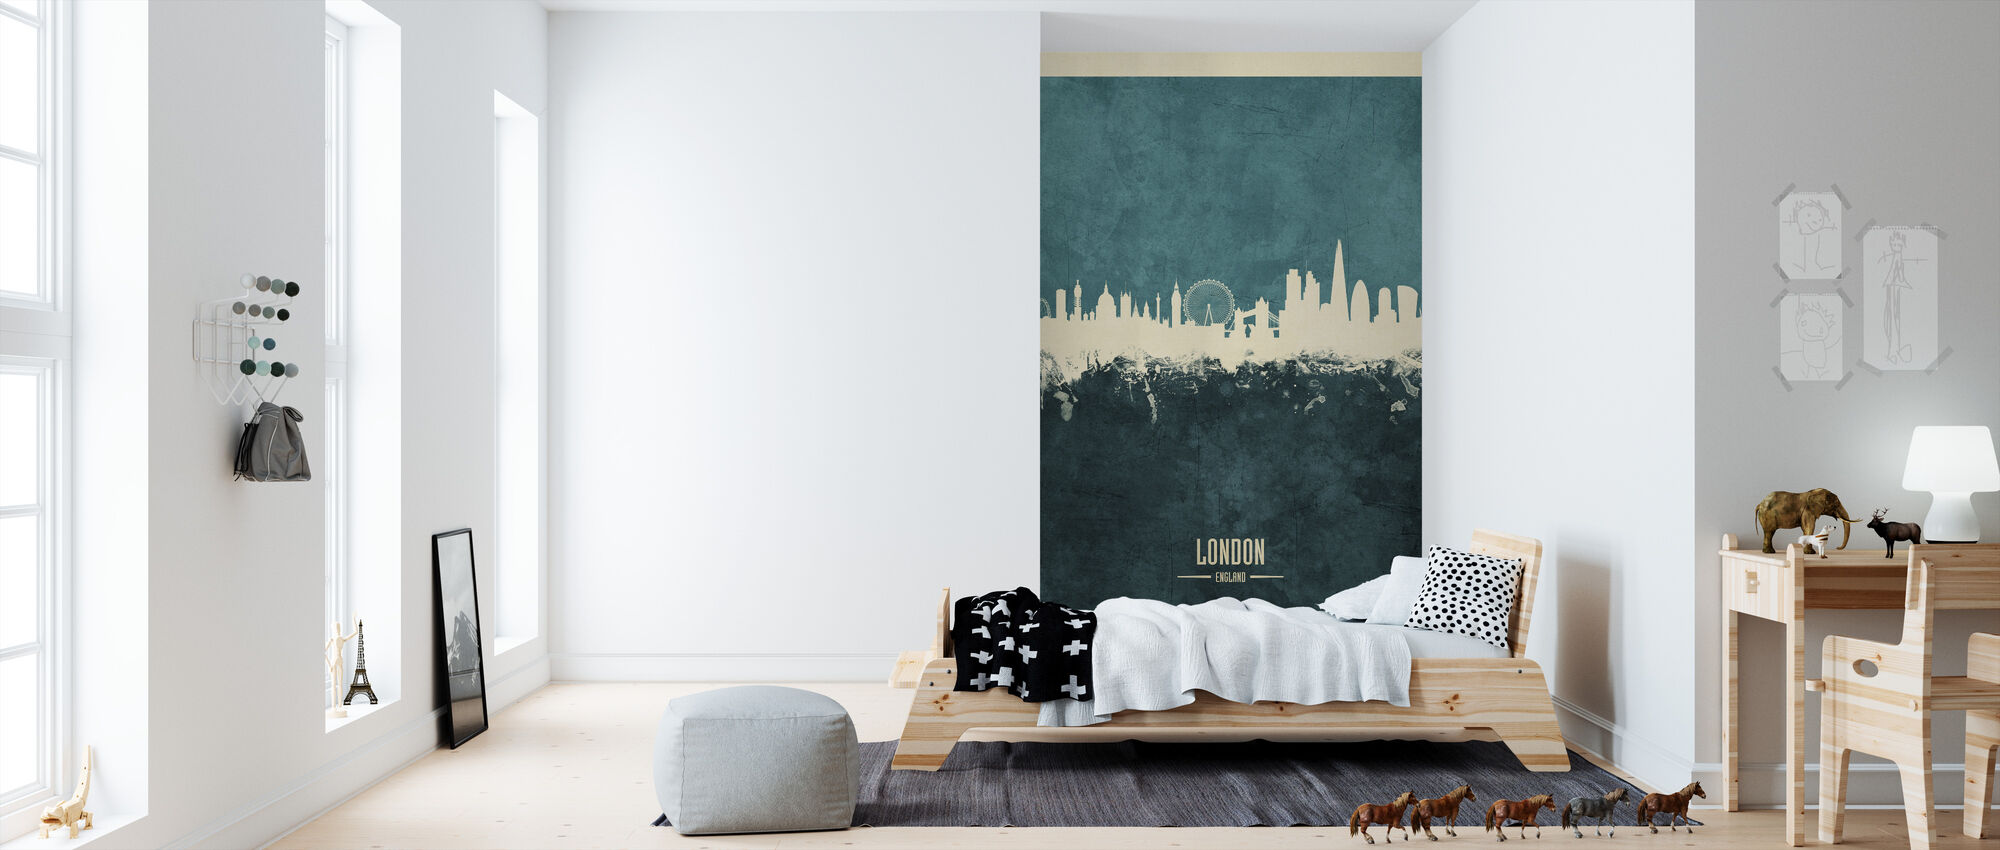 London Englanti Skyline Blue - Tapetti - Lastenhuone